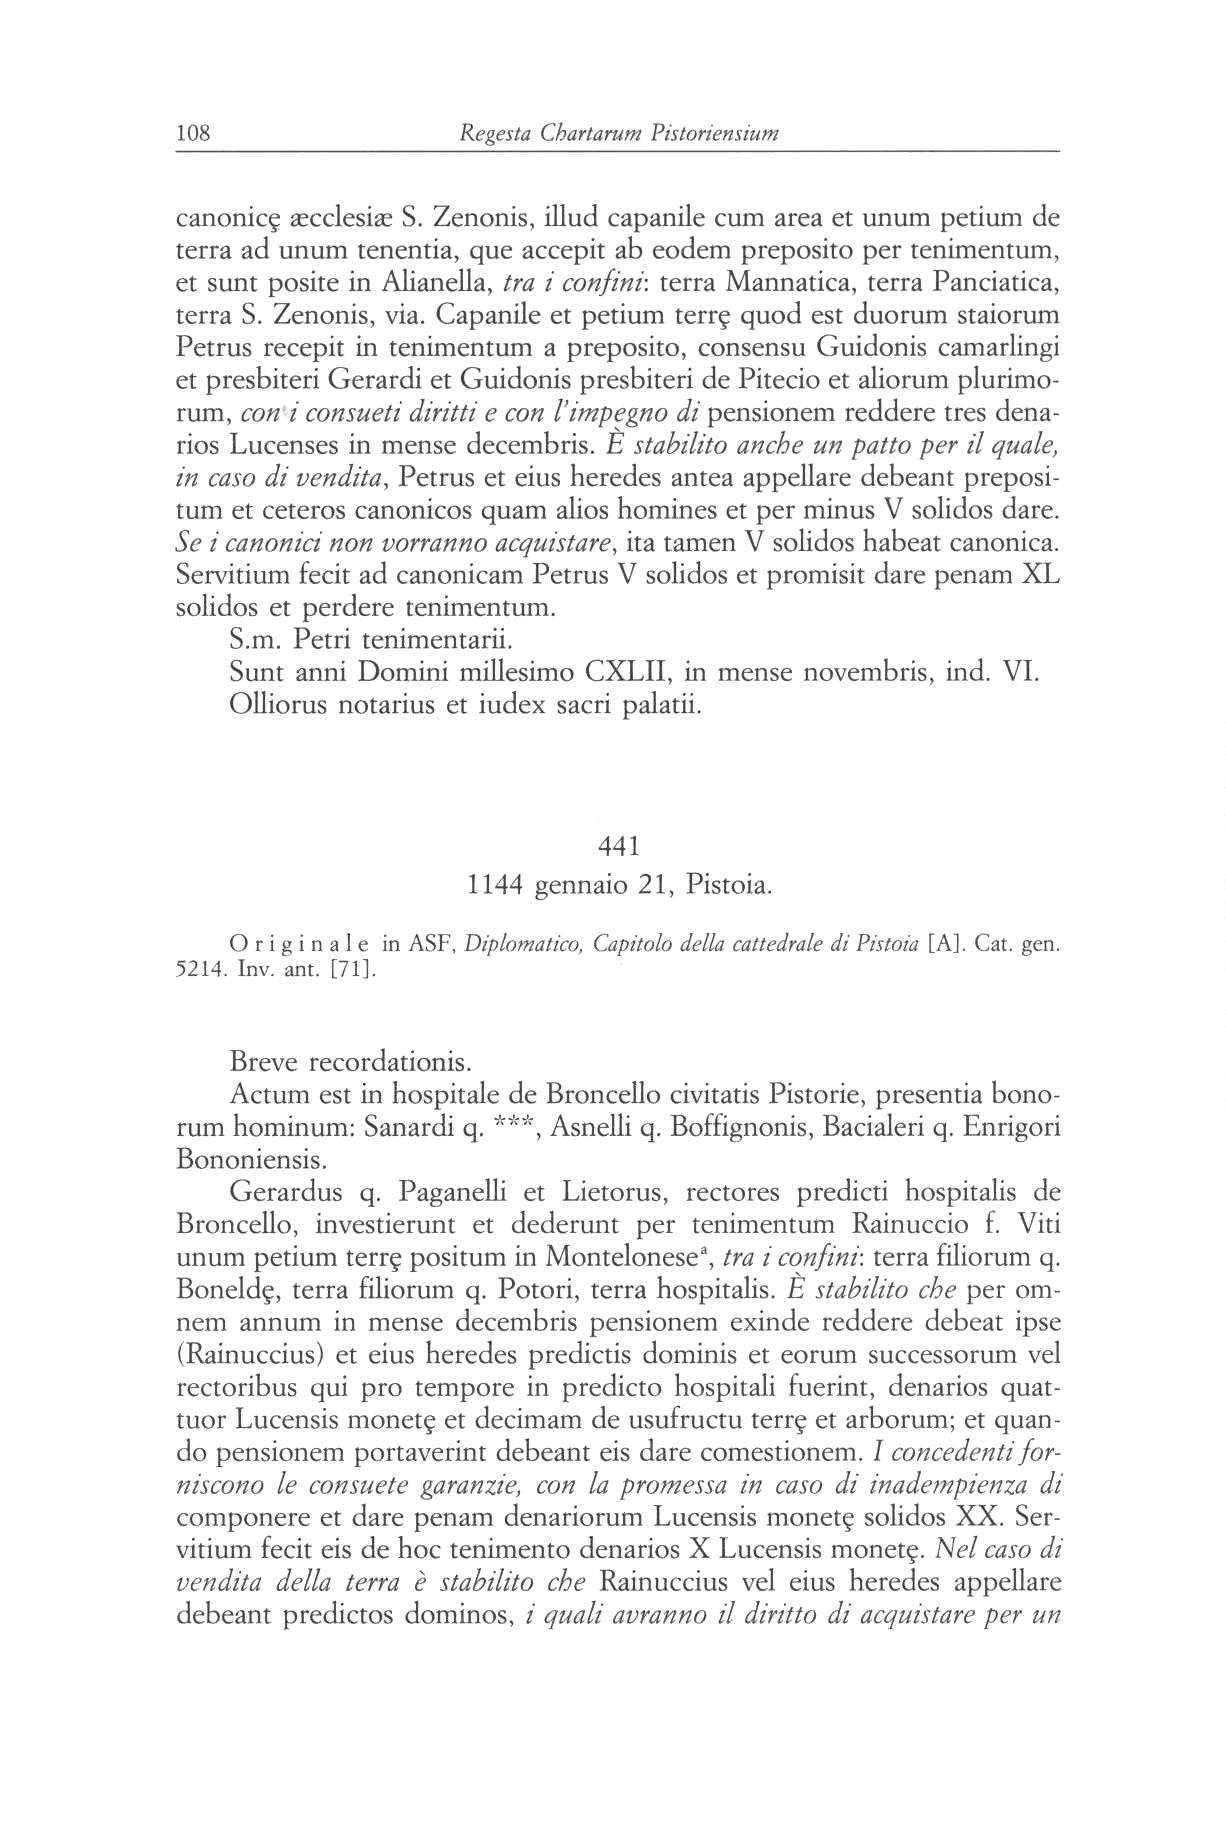 Canonica S. Zenone XII 0108.jpg